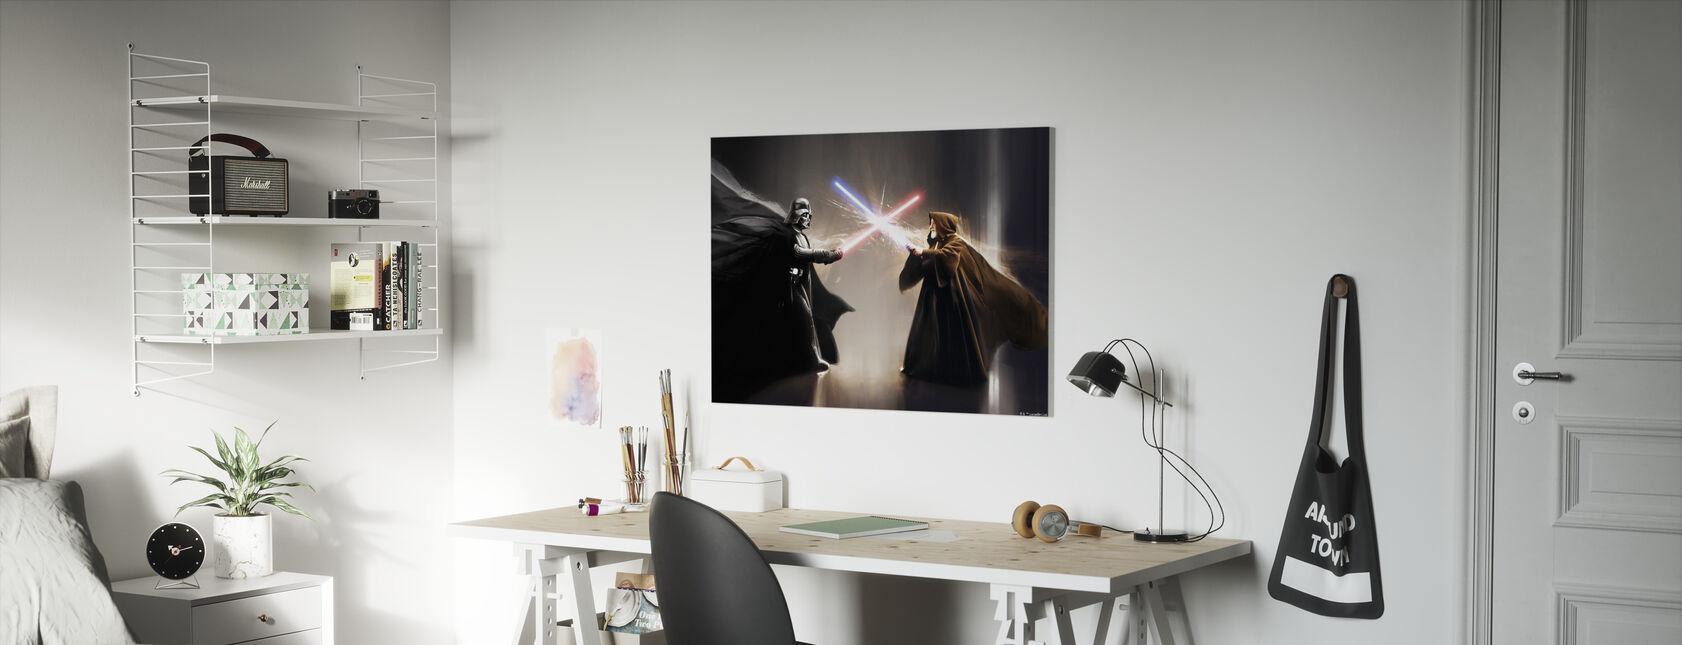 Tähtien sota - Darth Vader ja Obi-Wan Kenobi - Canvastaulu - Lastenhuone